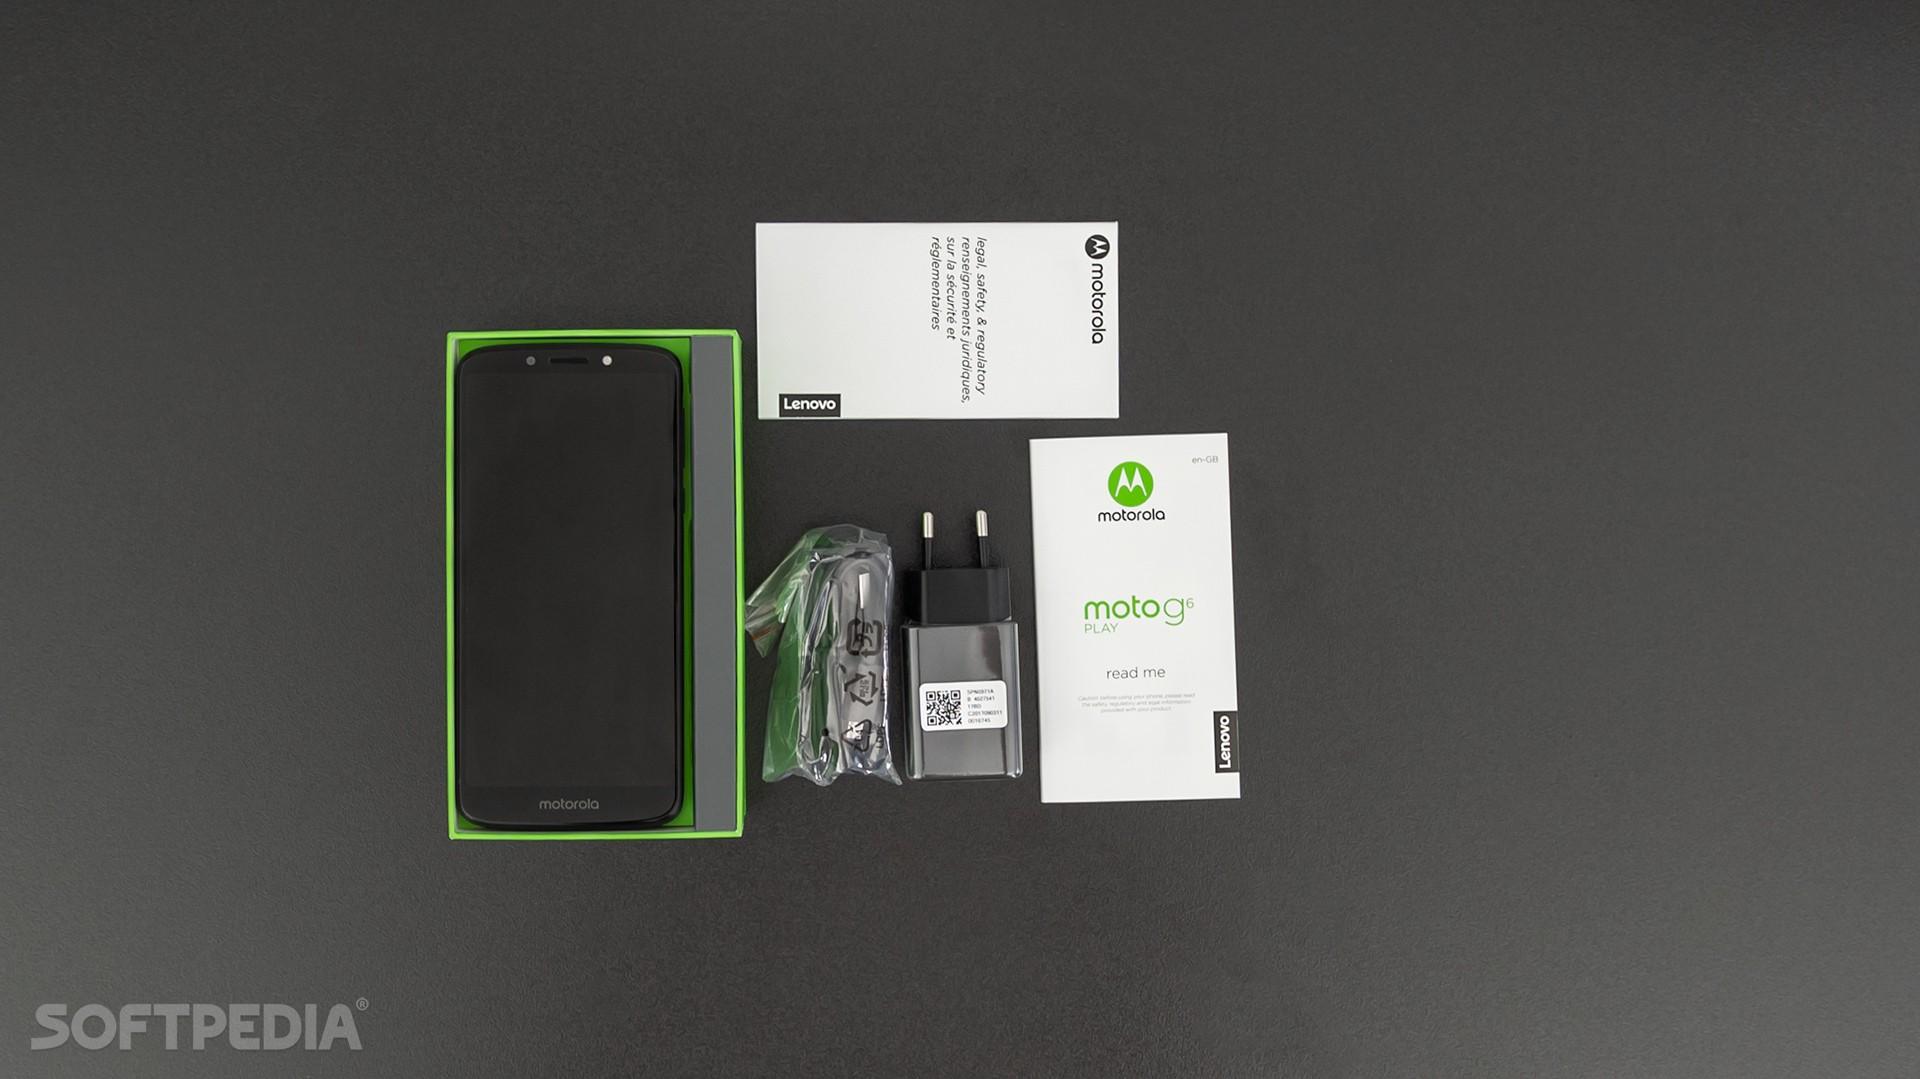 Motorola Moto G6 Play Review - Sweet Mediocrity